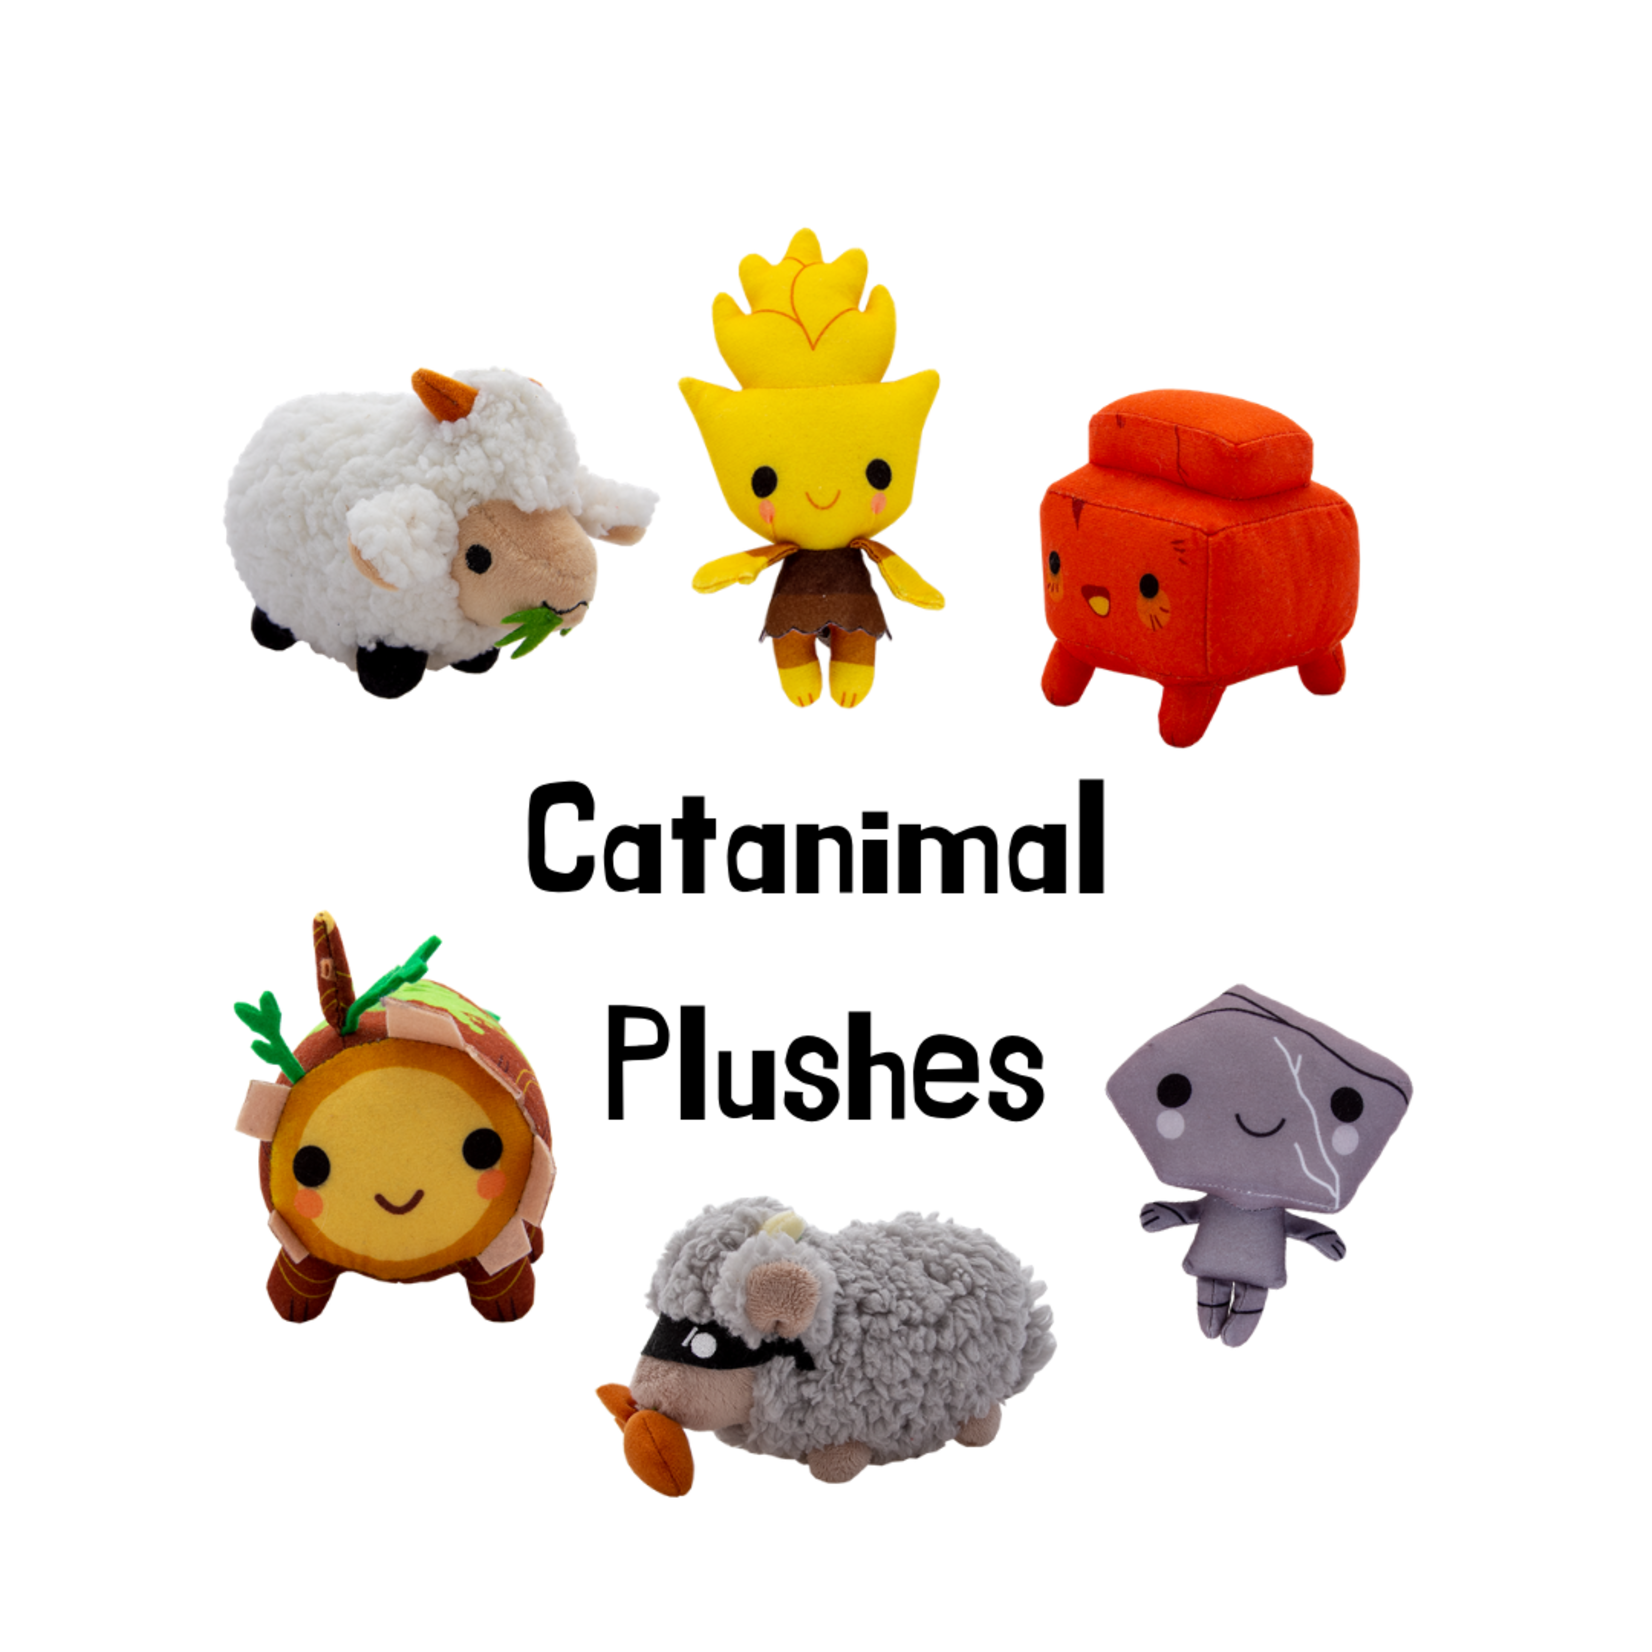 CATANIMAL Plushies